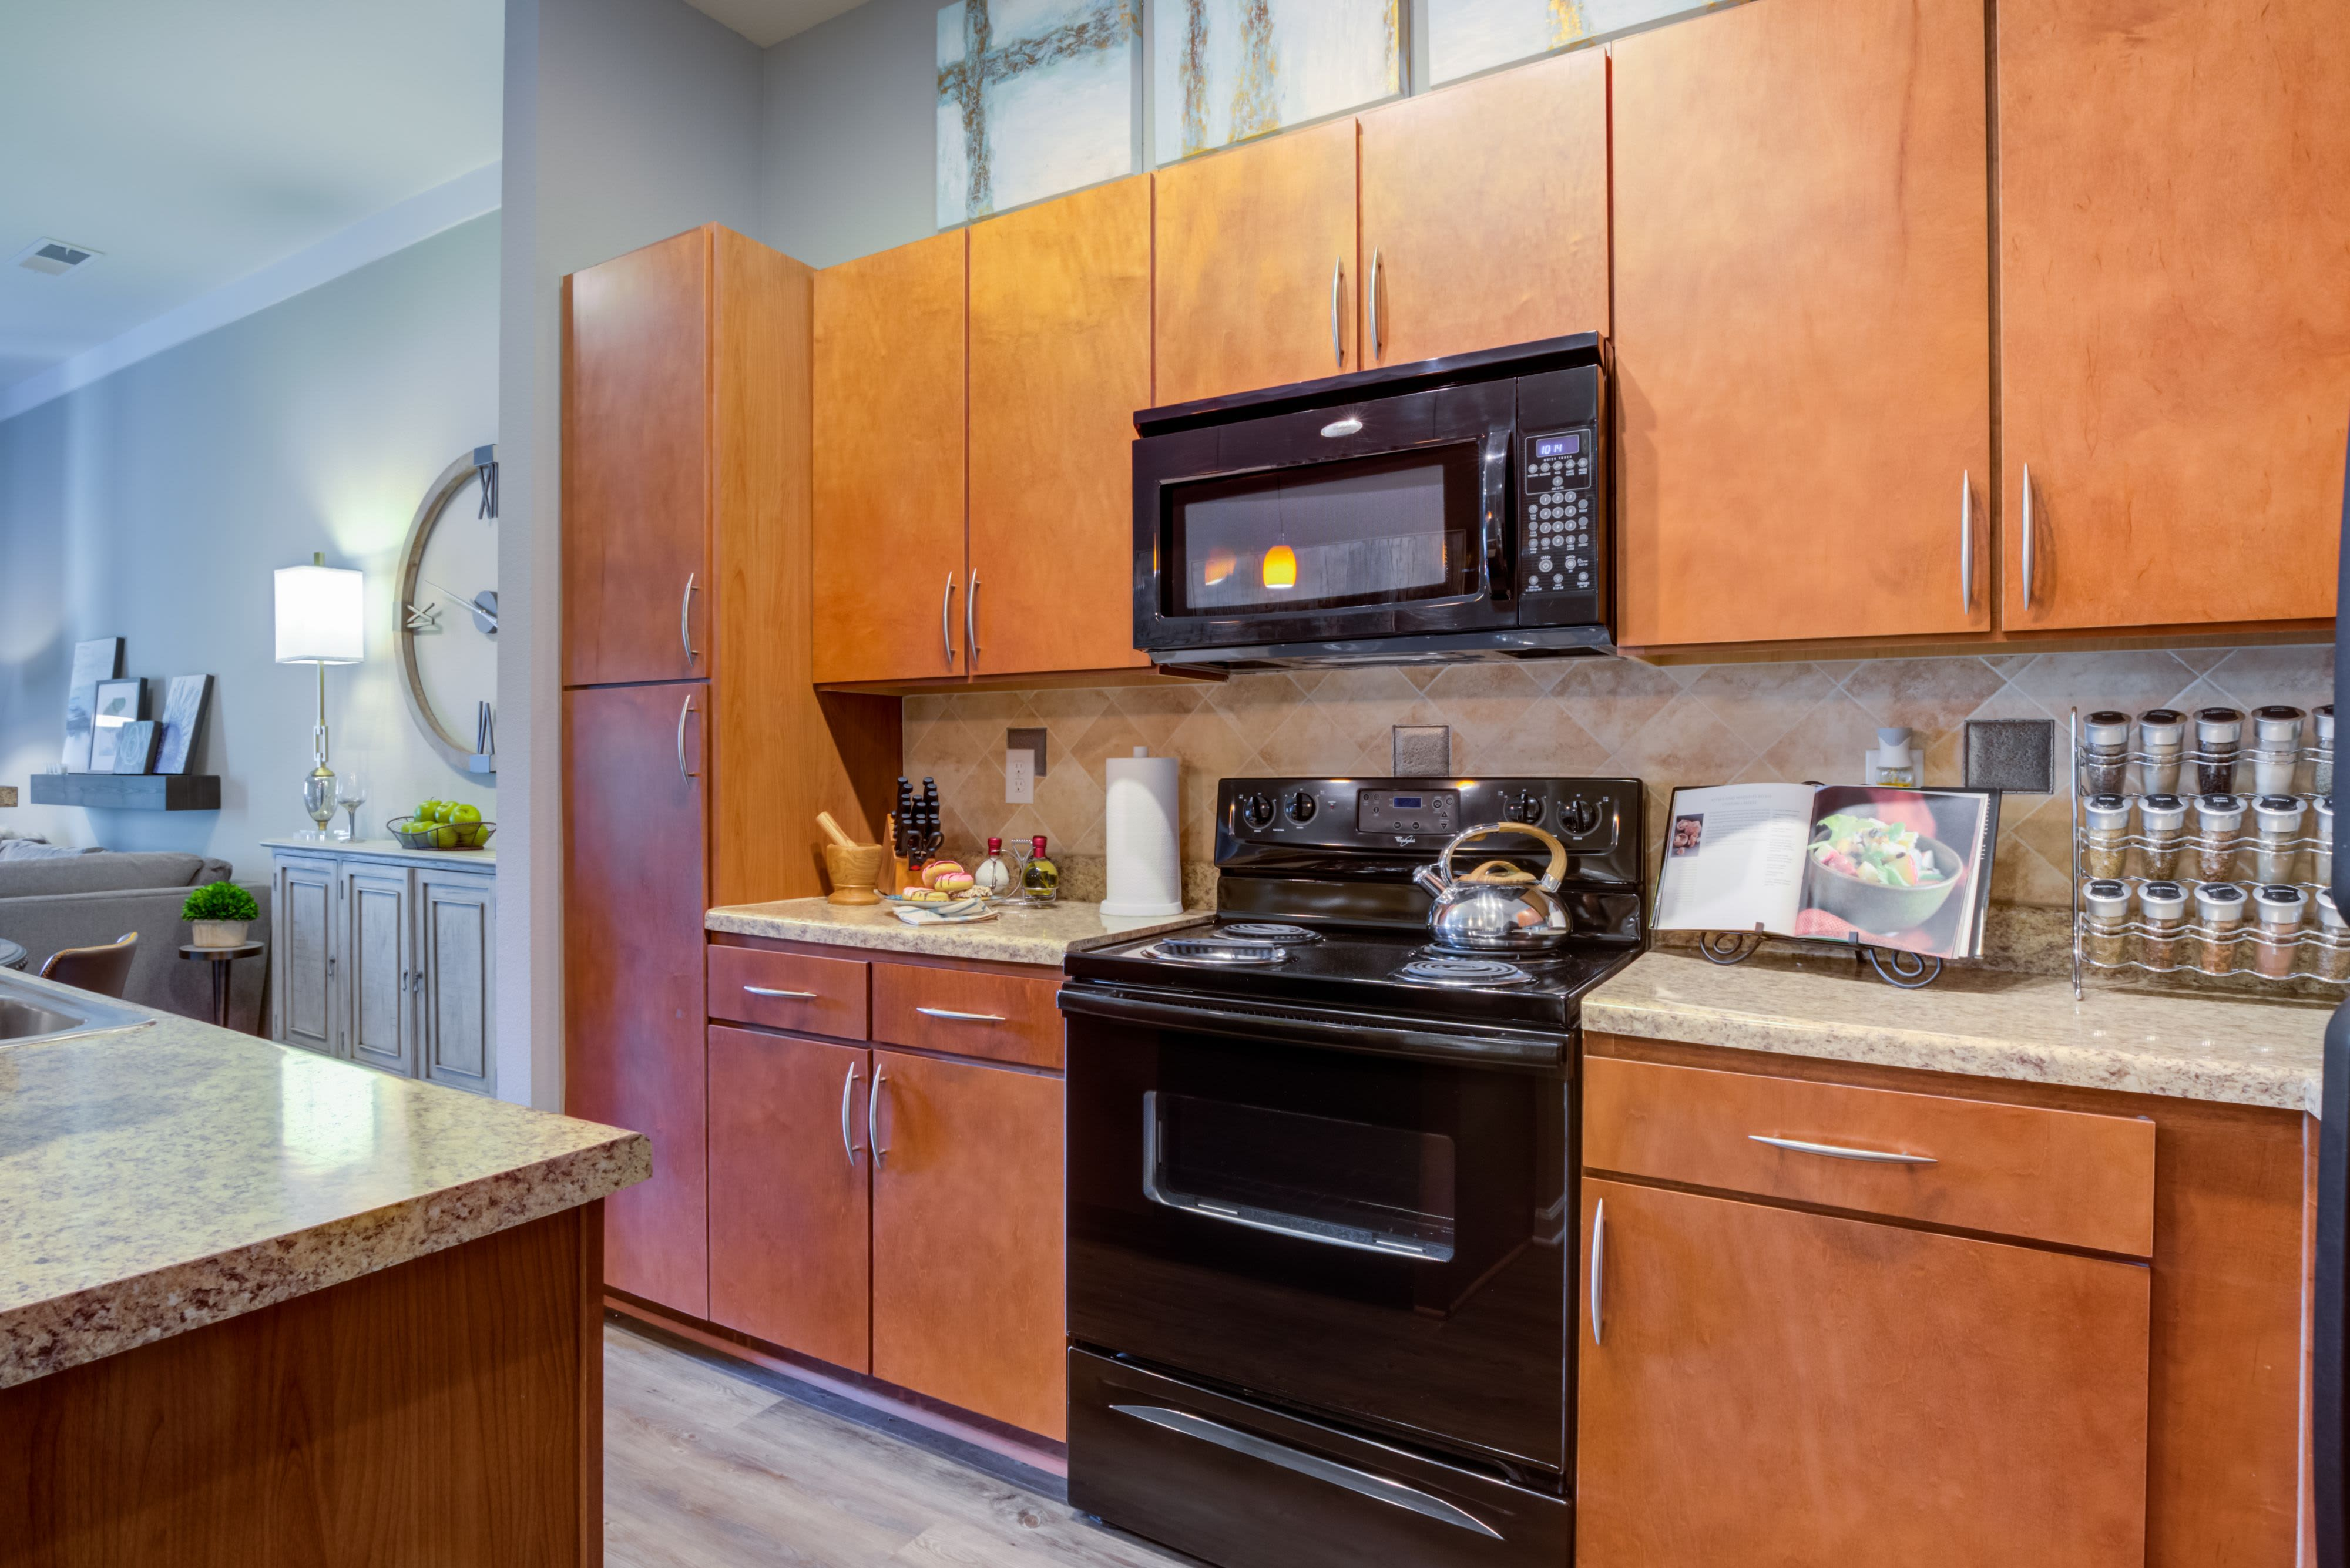 Model kitchen at Celsius Apartment Homes in Charlotte, North Carolina